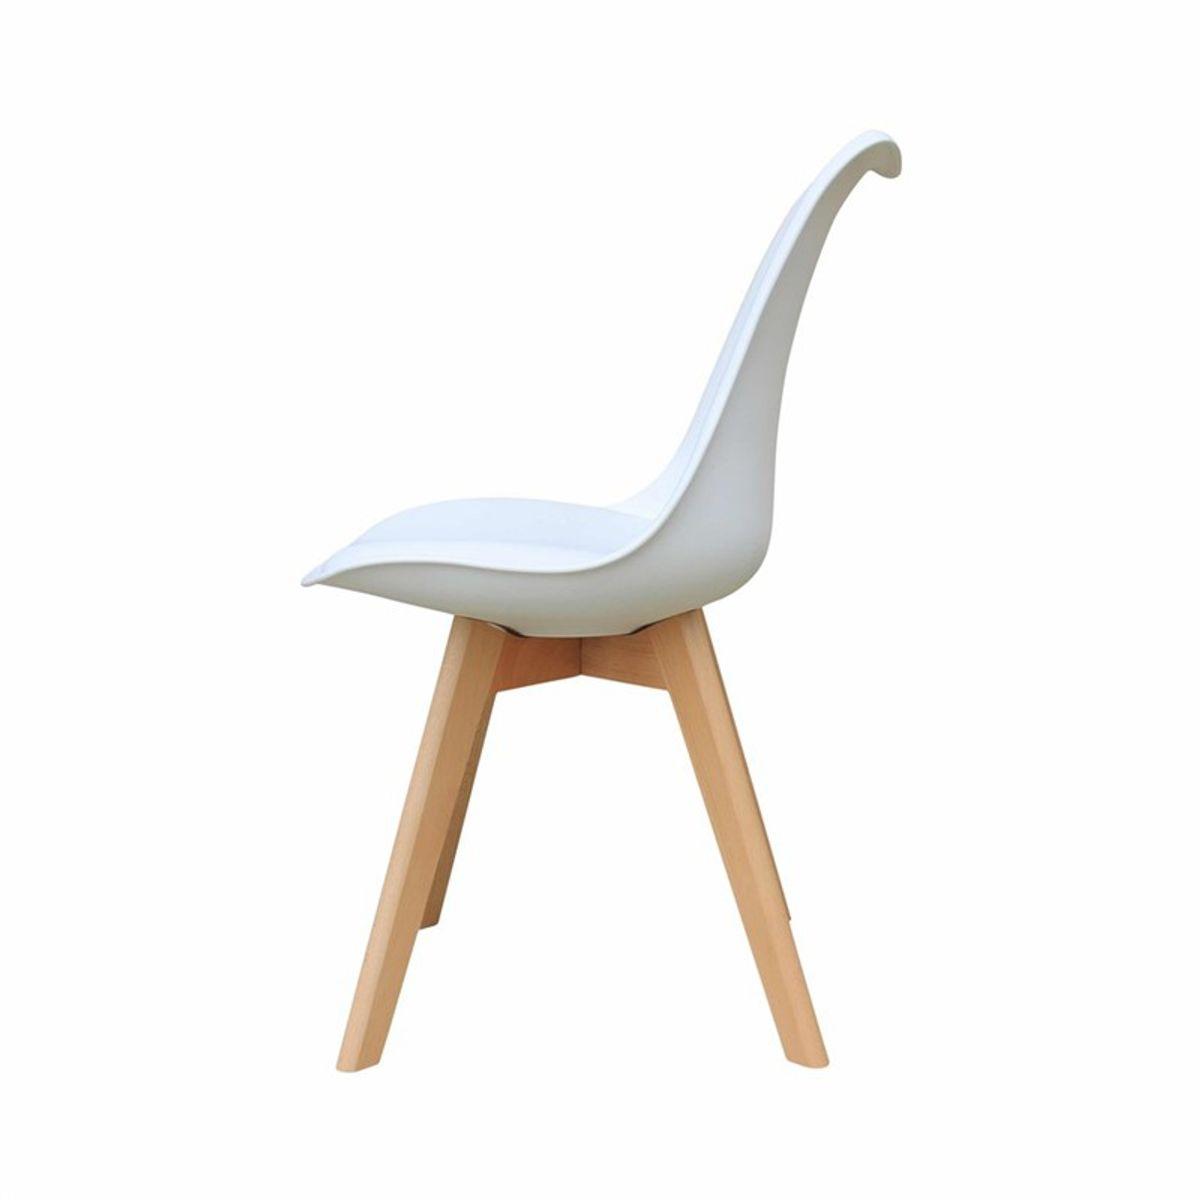 Chaise scandinave blanche Alba